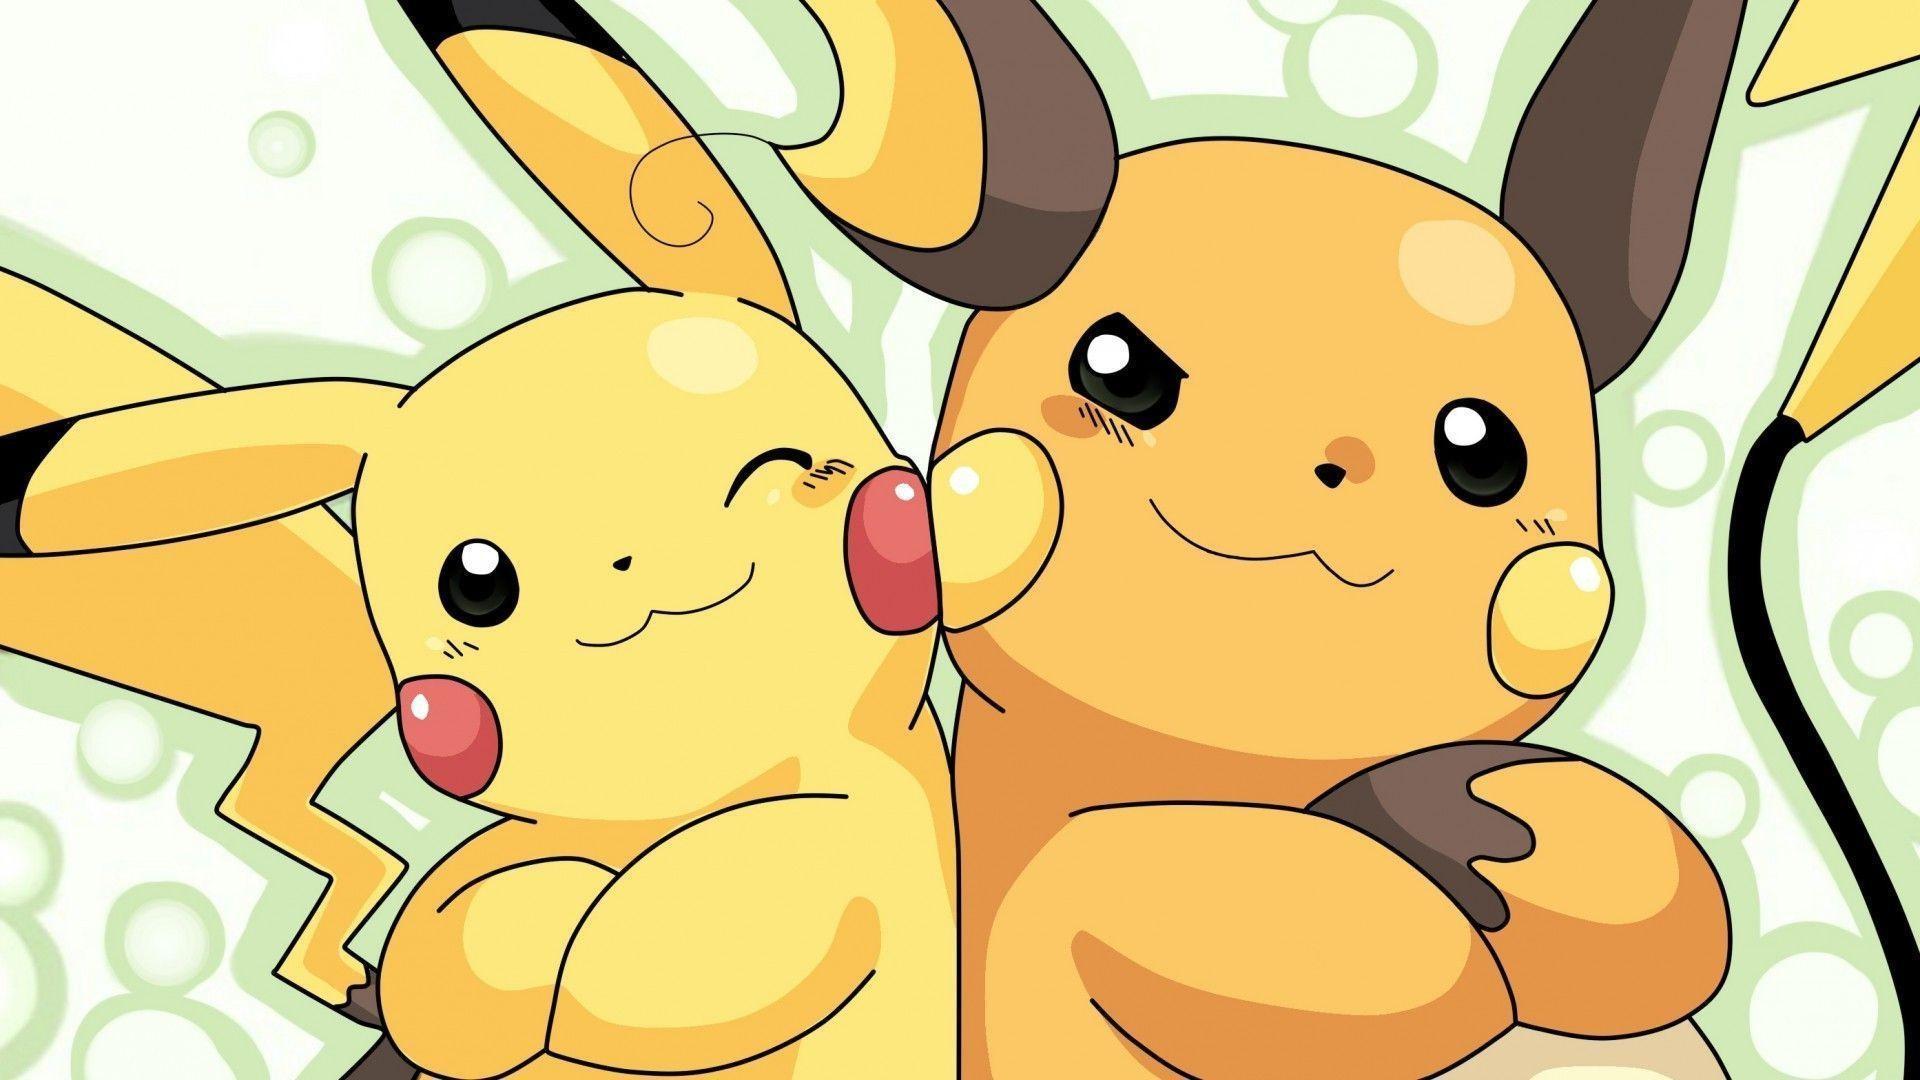 anime, Raichu, Pikachu Wallpapers HD / Desktop and Mobile Backgrounds